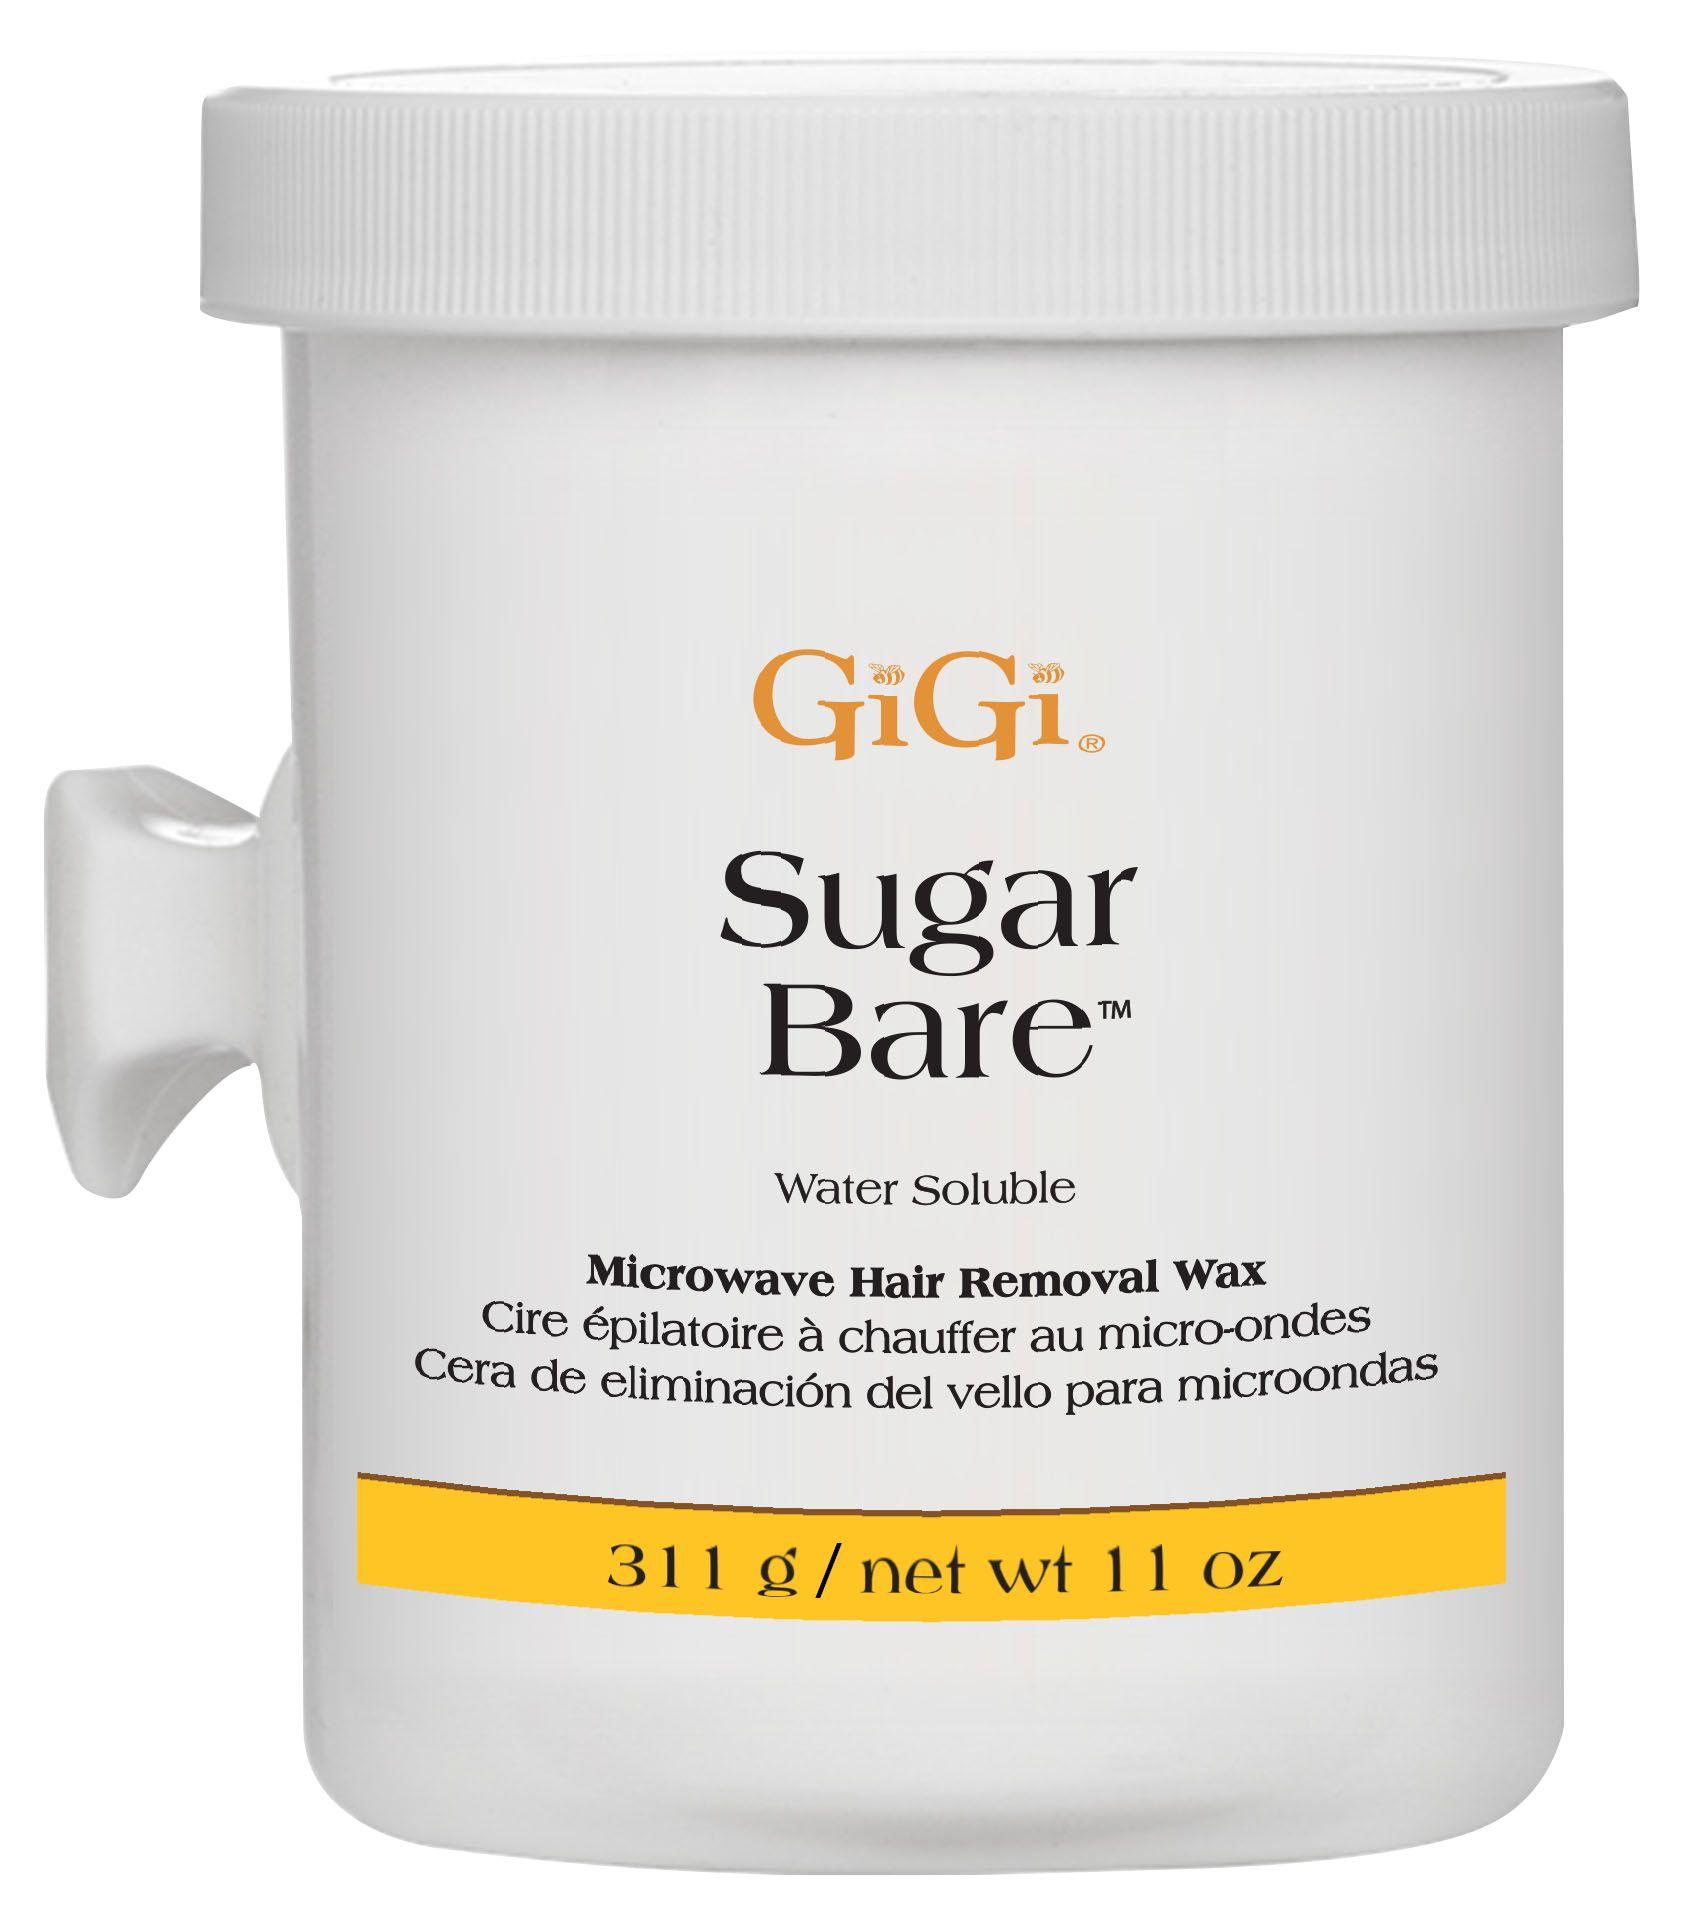 Sugar Bare Microwave Wax Gigiwax Gigispa Legswaxed Honeewax Microwavewax Getgigiwithit Smoothskin Hairless Gigiwaxing Hairremoval